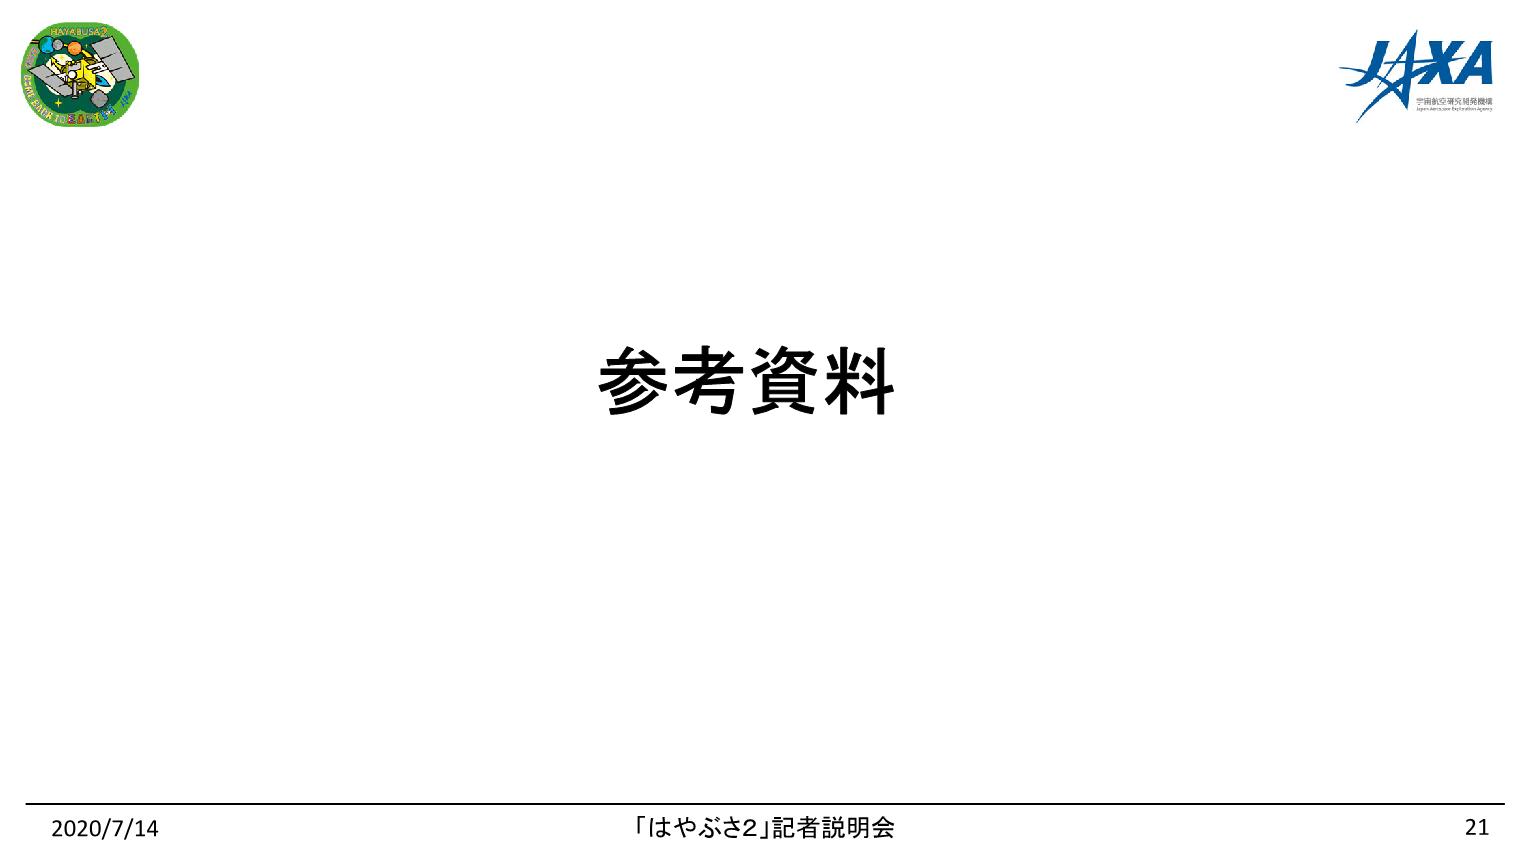 f:id:Imamura:20200714230402p:plain